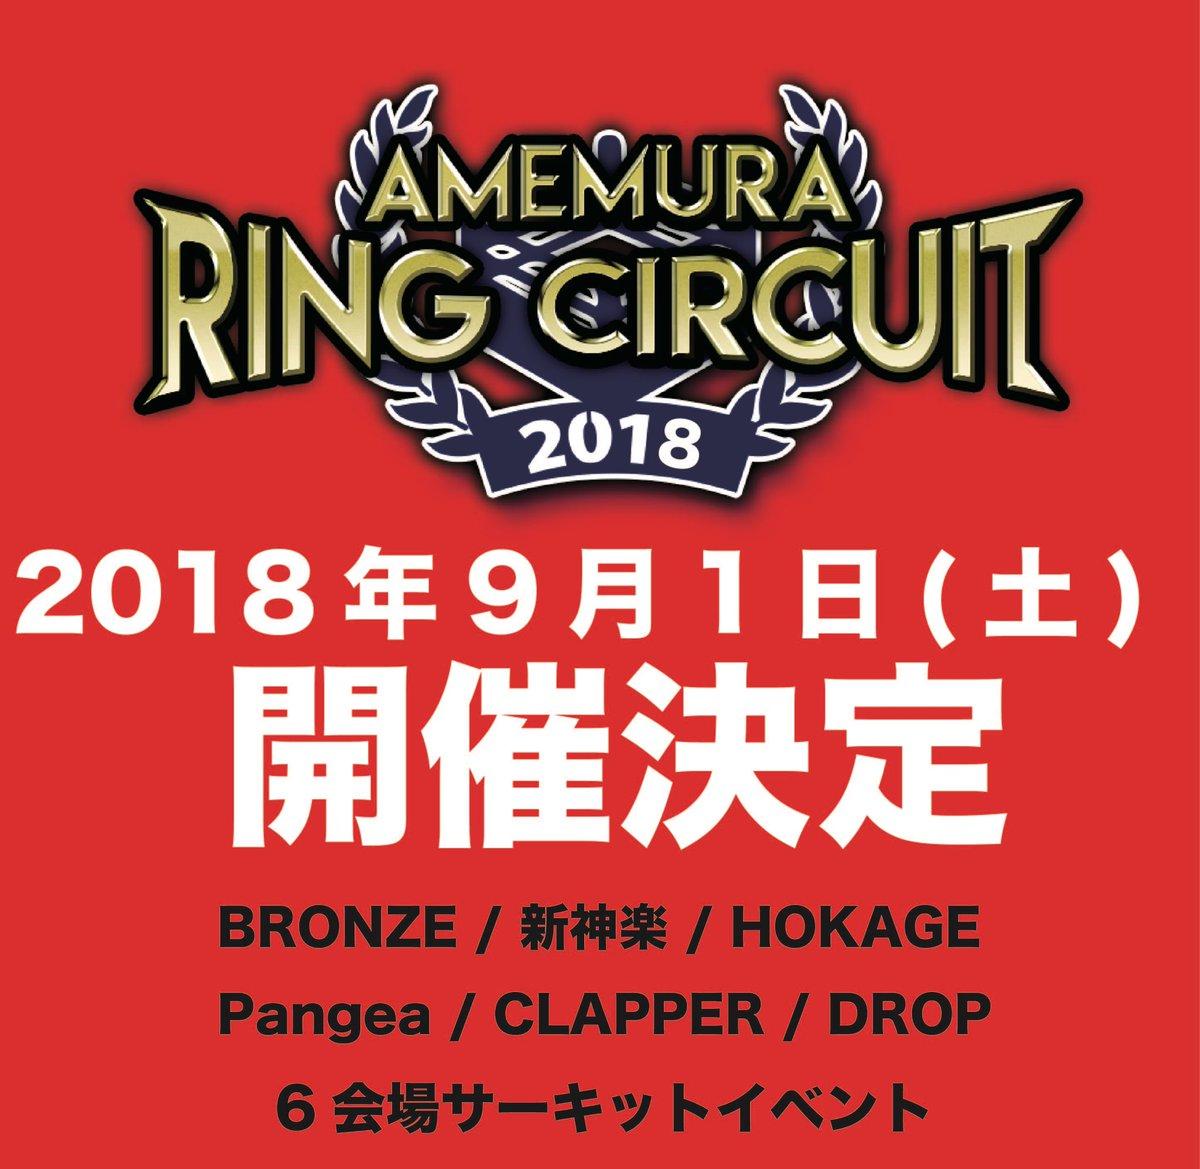 Ring Circuit 2018 On Twitter Amemura Ringcircuit Ddezazgu0ayvqzm